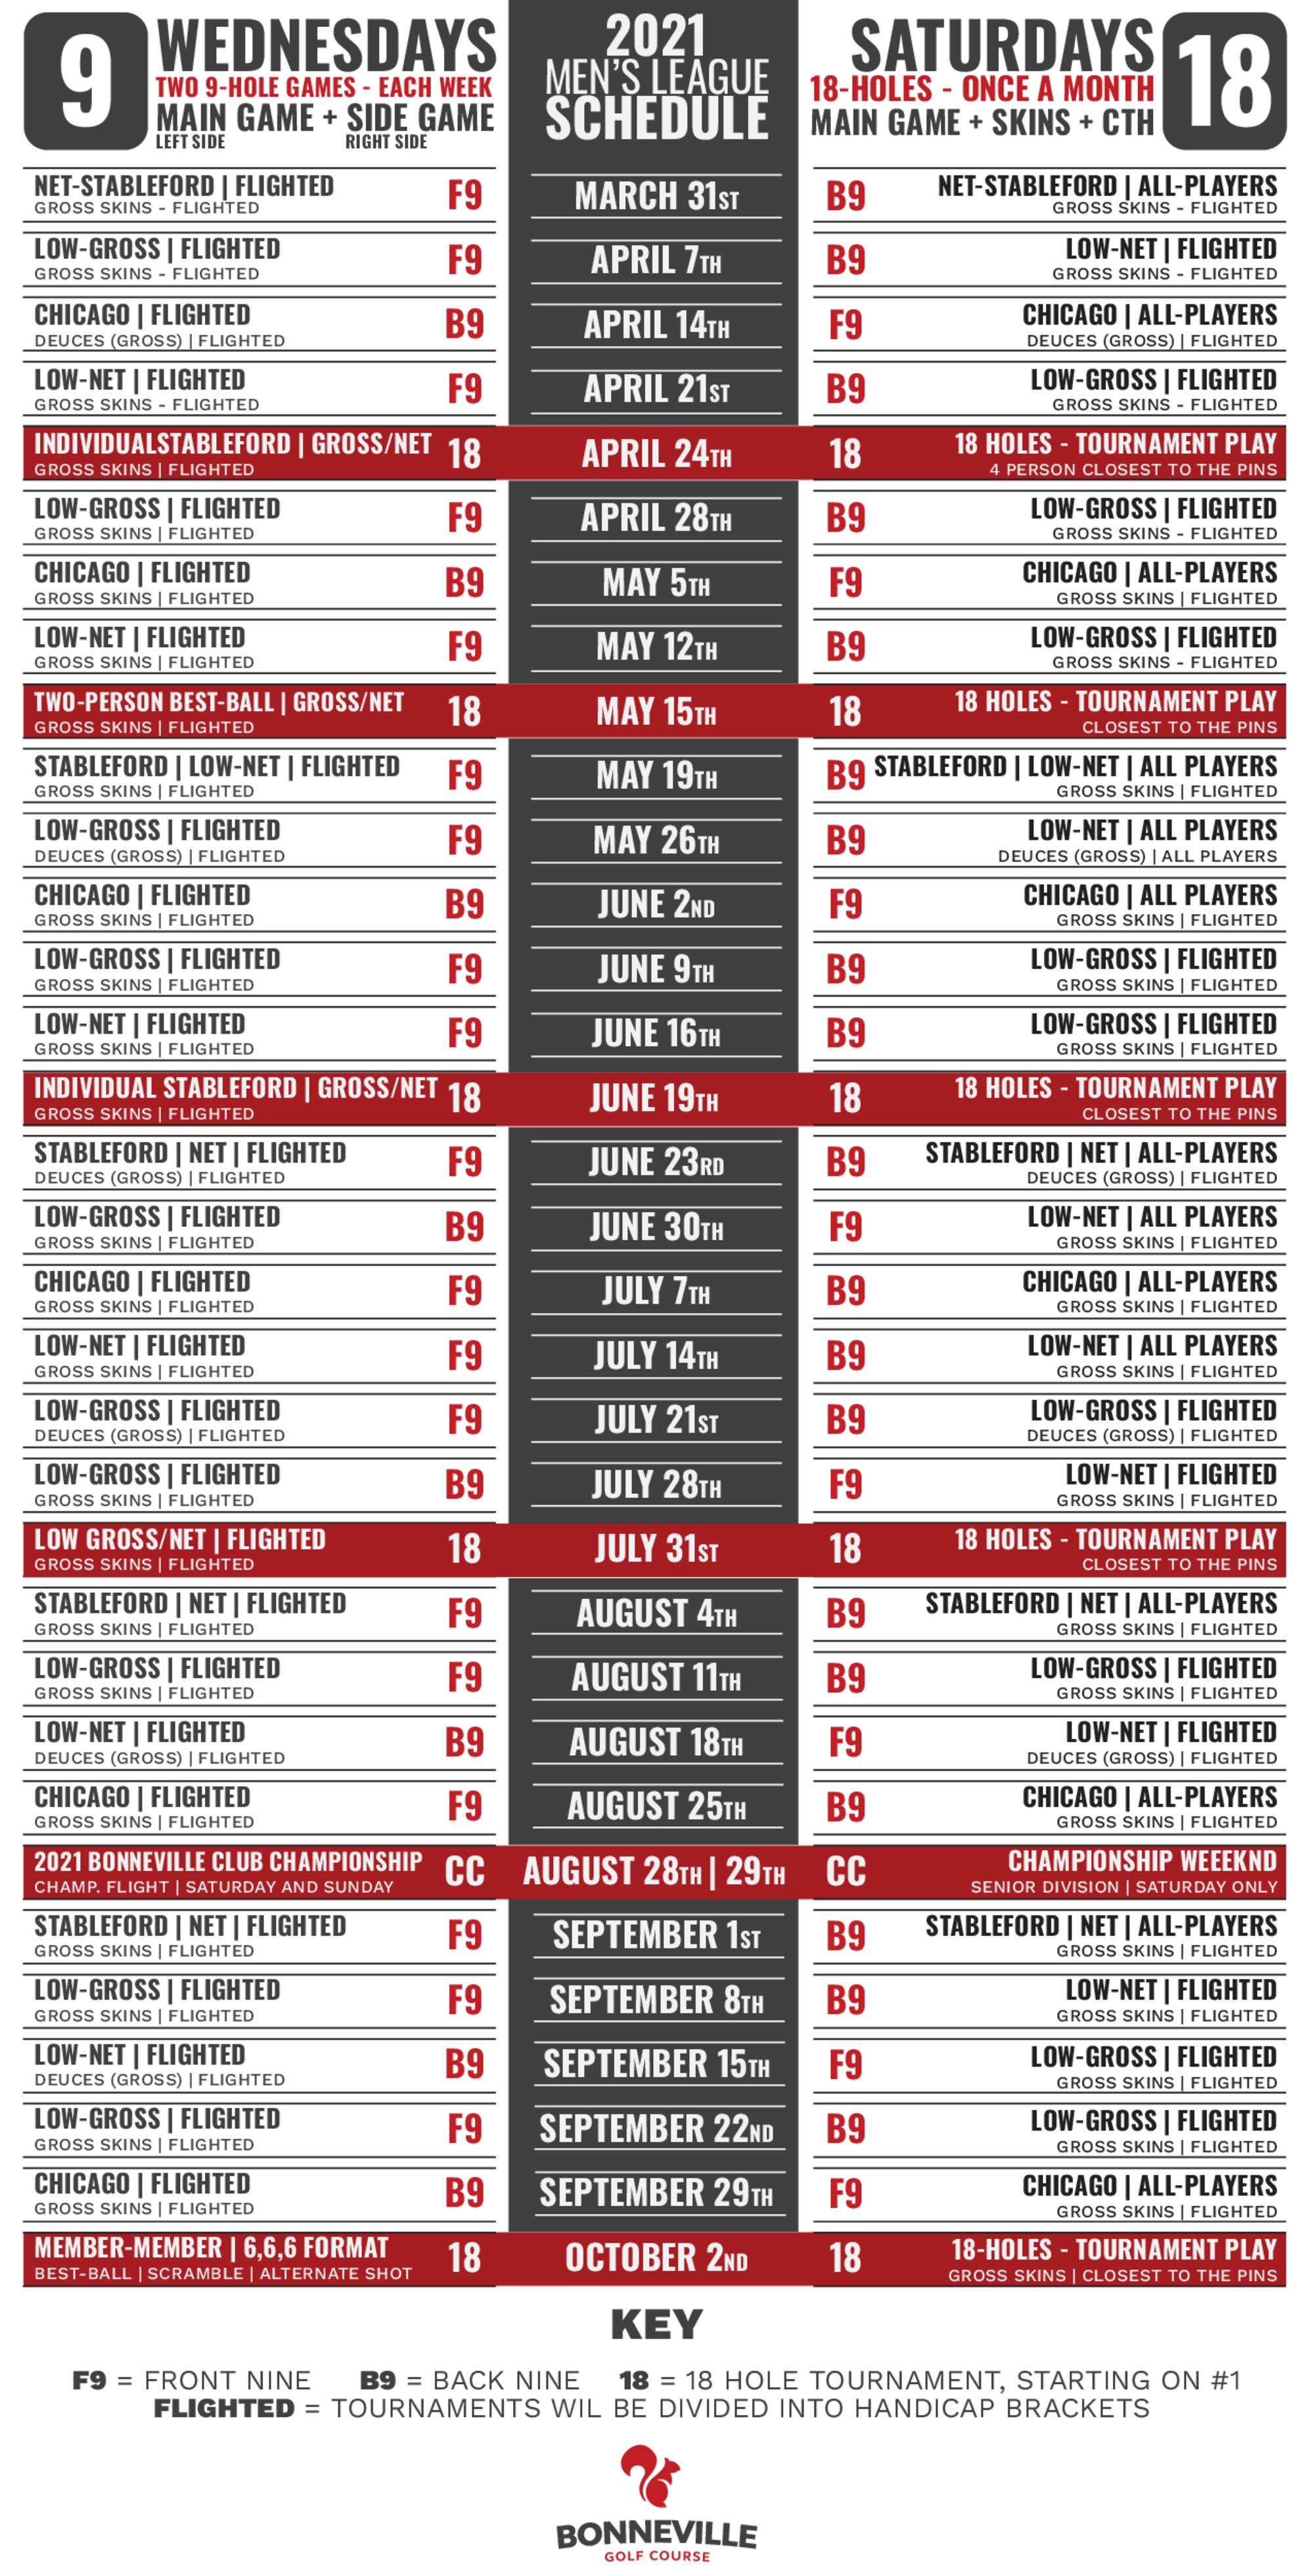 2021 men s league game schedule new 1